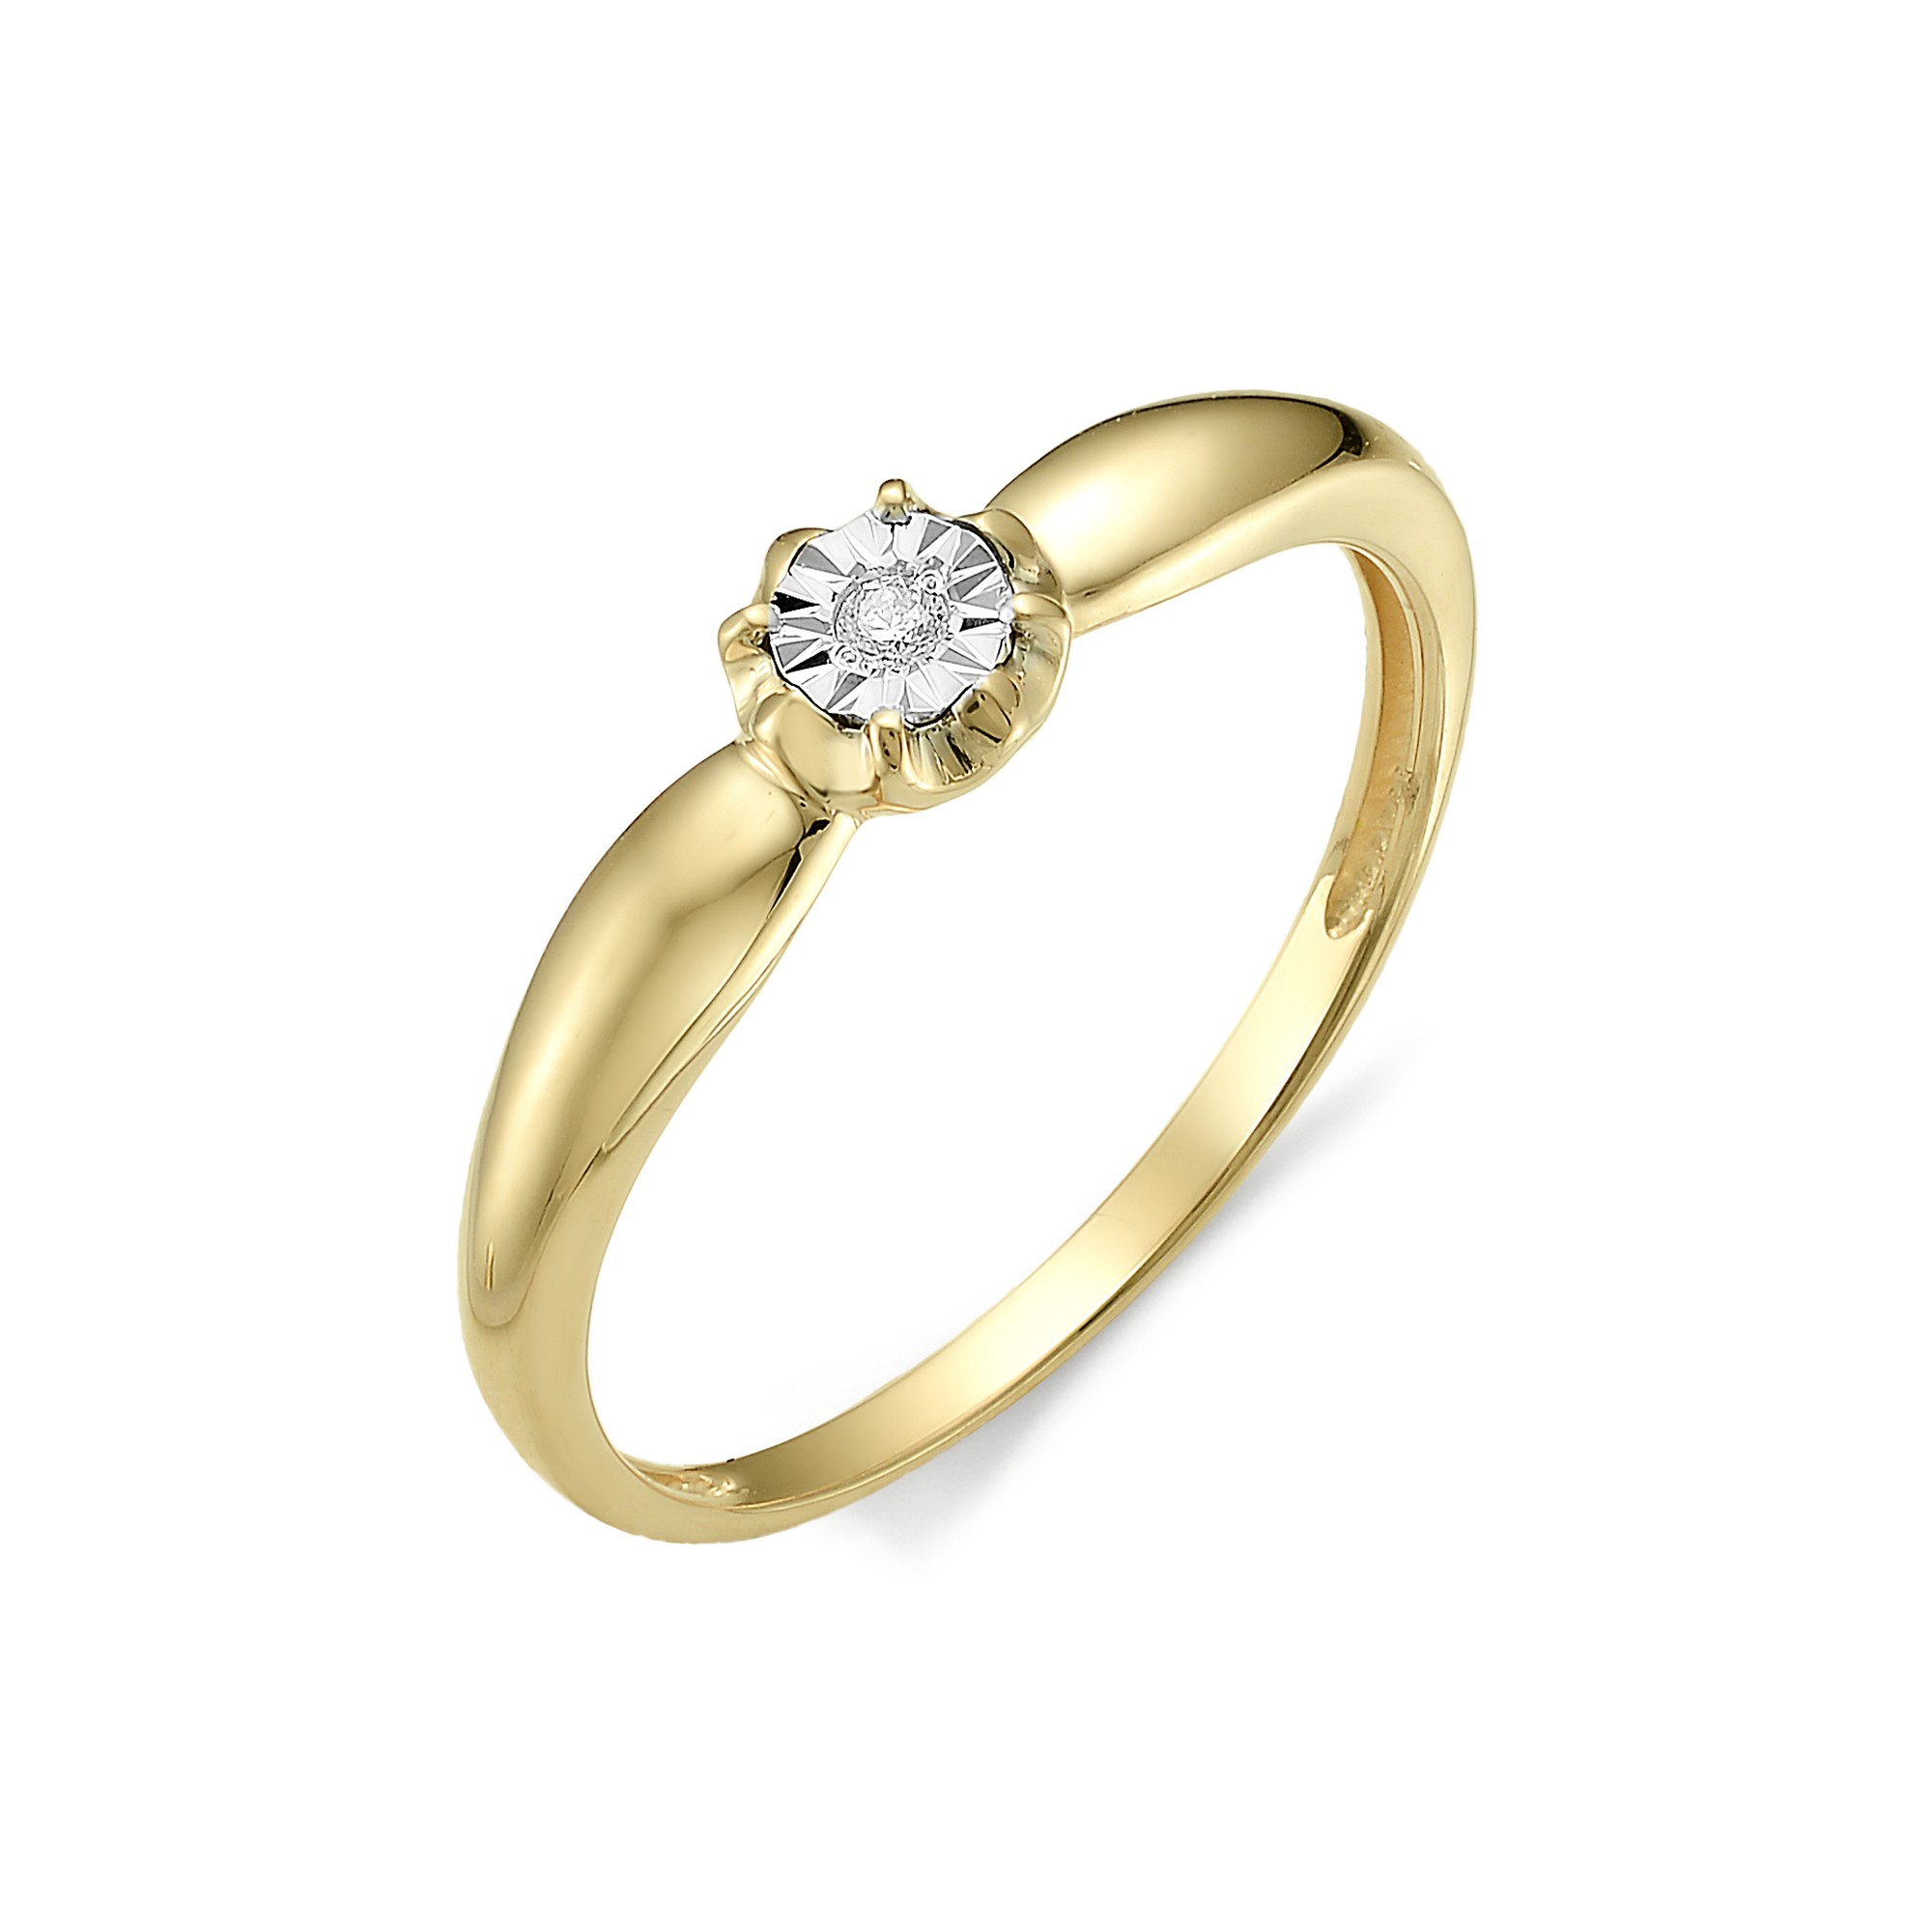 картинка кольцо 11965-300 1 бриллиант круг 57 0,016 60-90 4/5а 11965-300